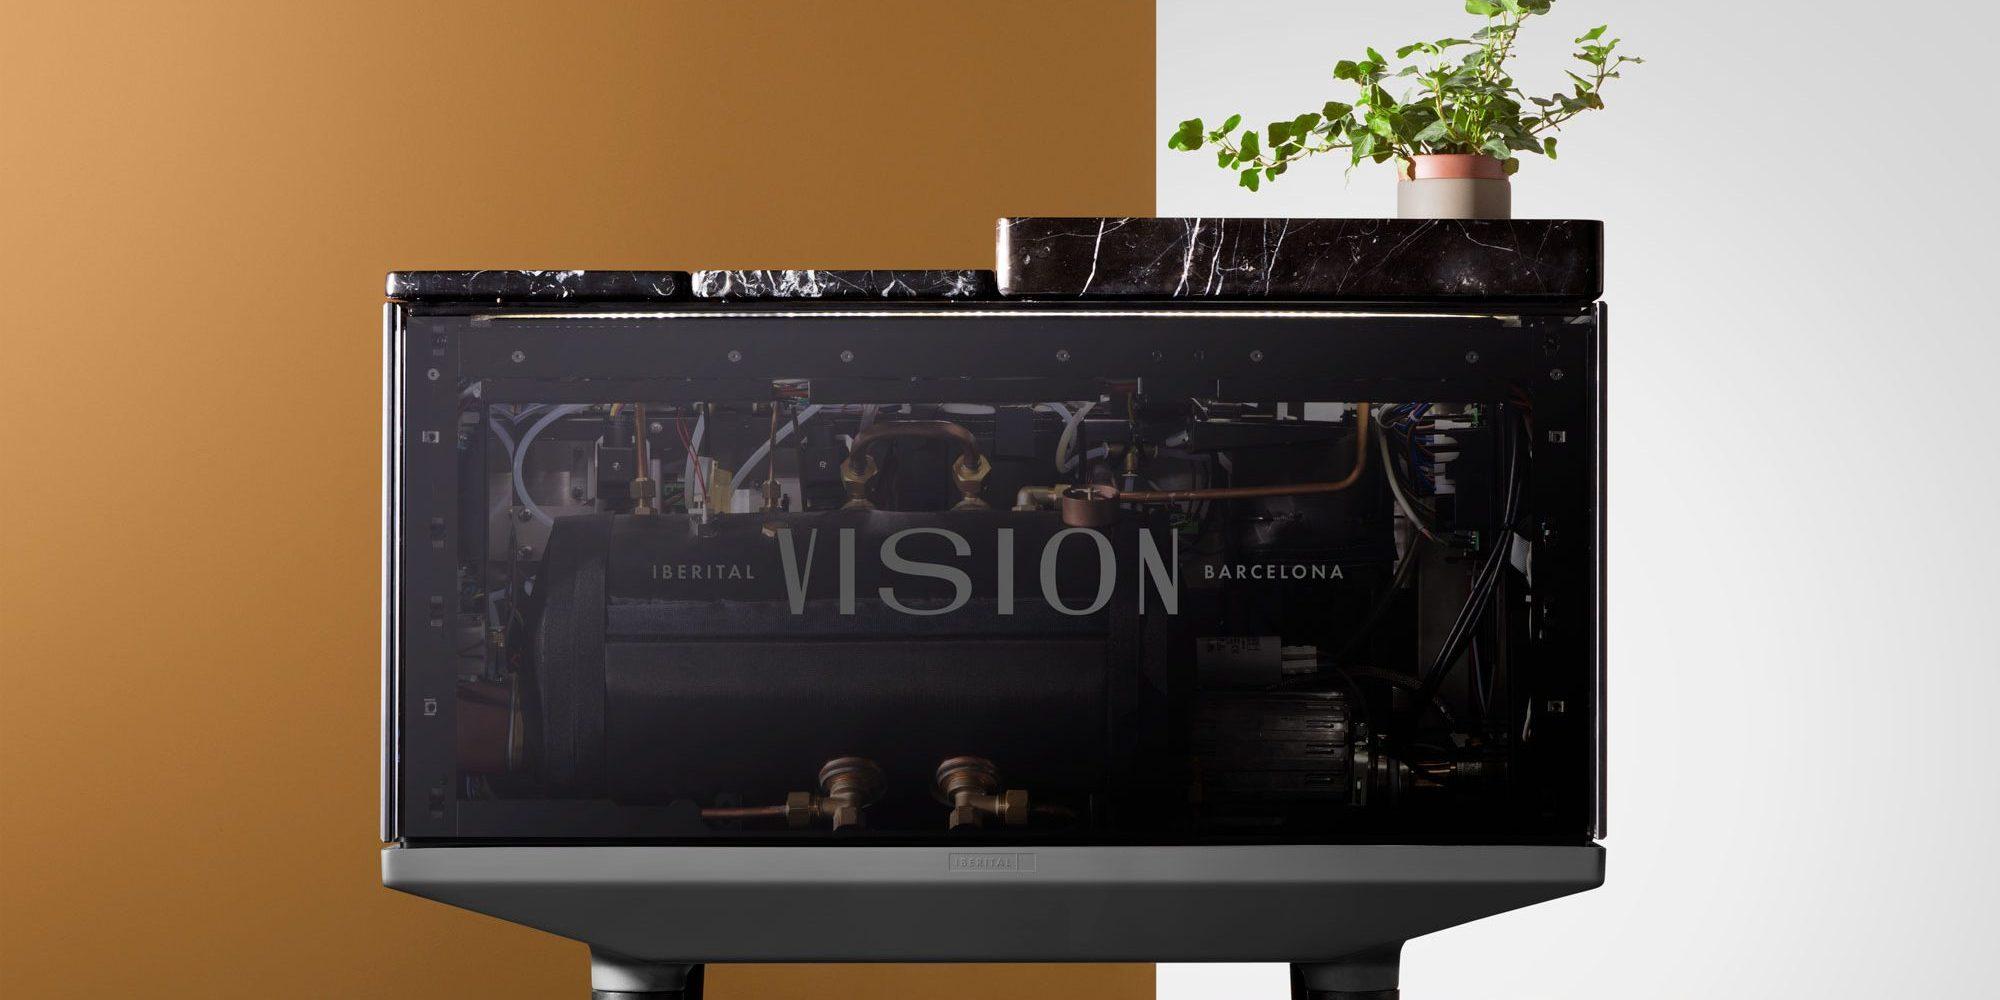 vision-maquina-1-2000x1342-c